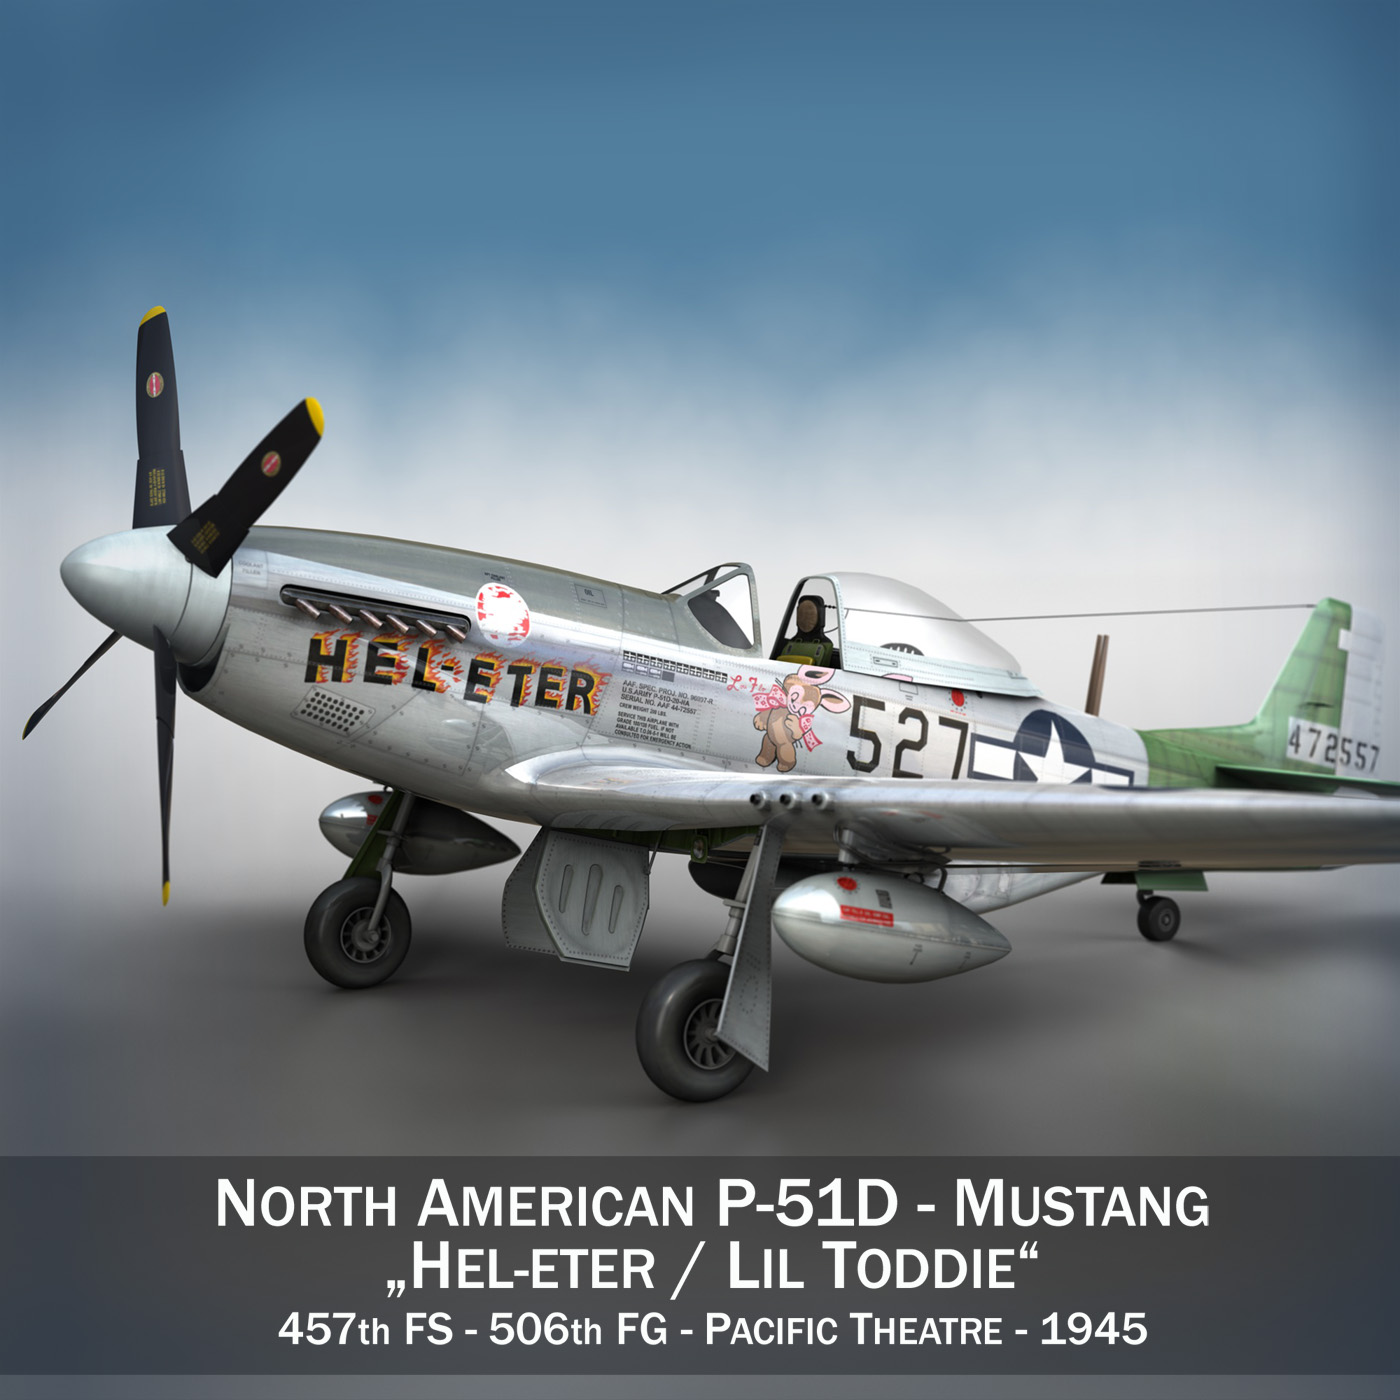 Ziemeļamerikas p-51d - mustang - heleter 3d modelis fbx c4d lwo obj 267540